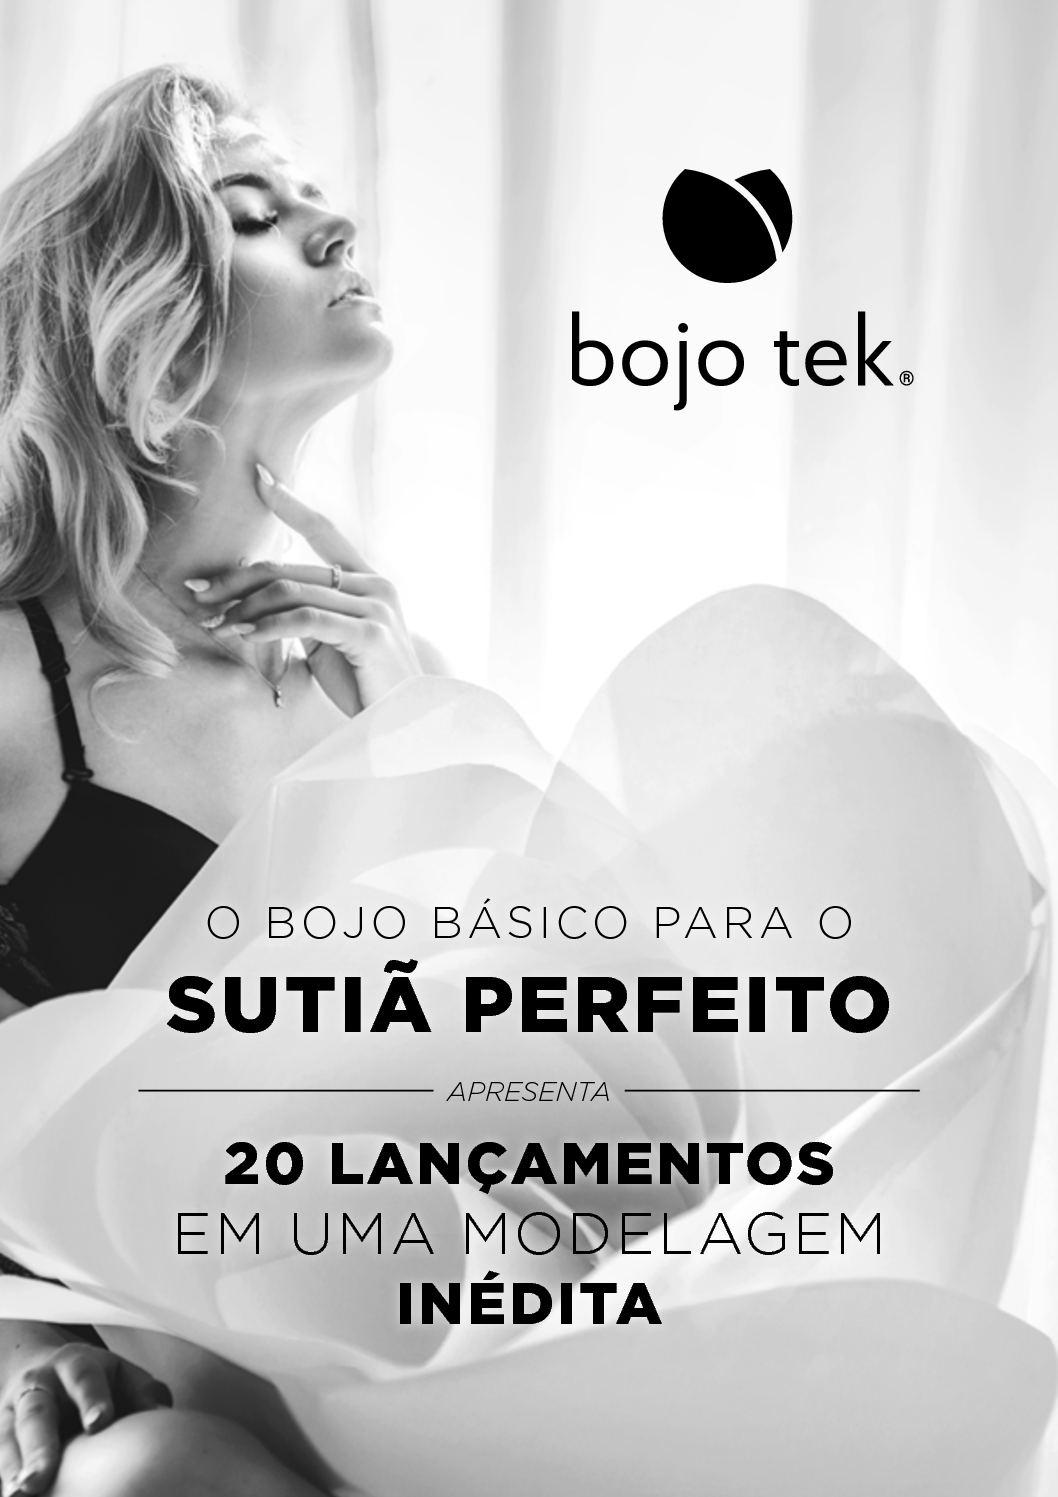 Catálogo Bojo Tek 2017